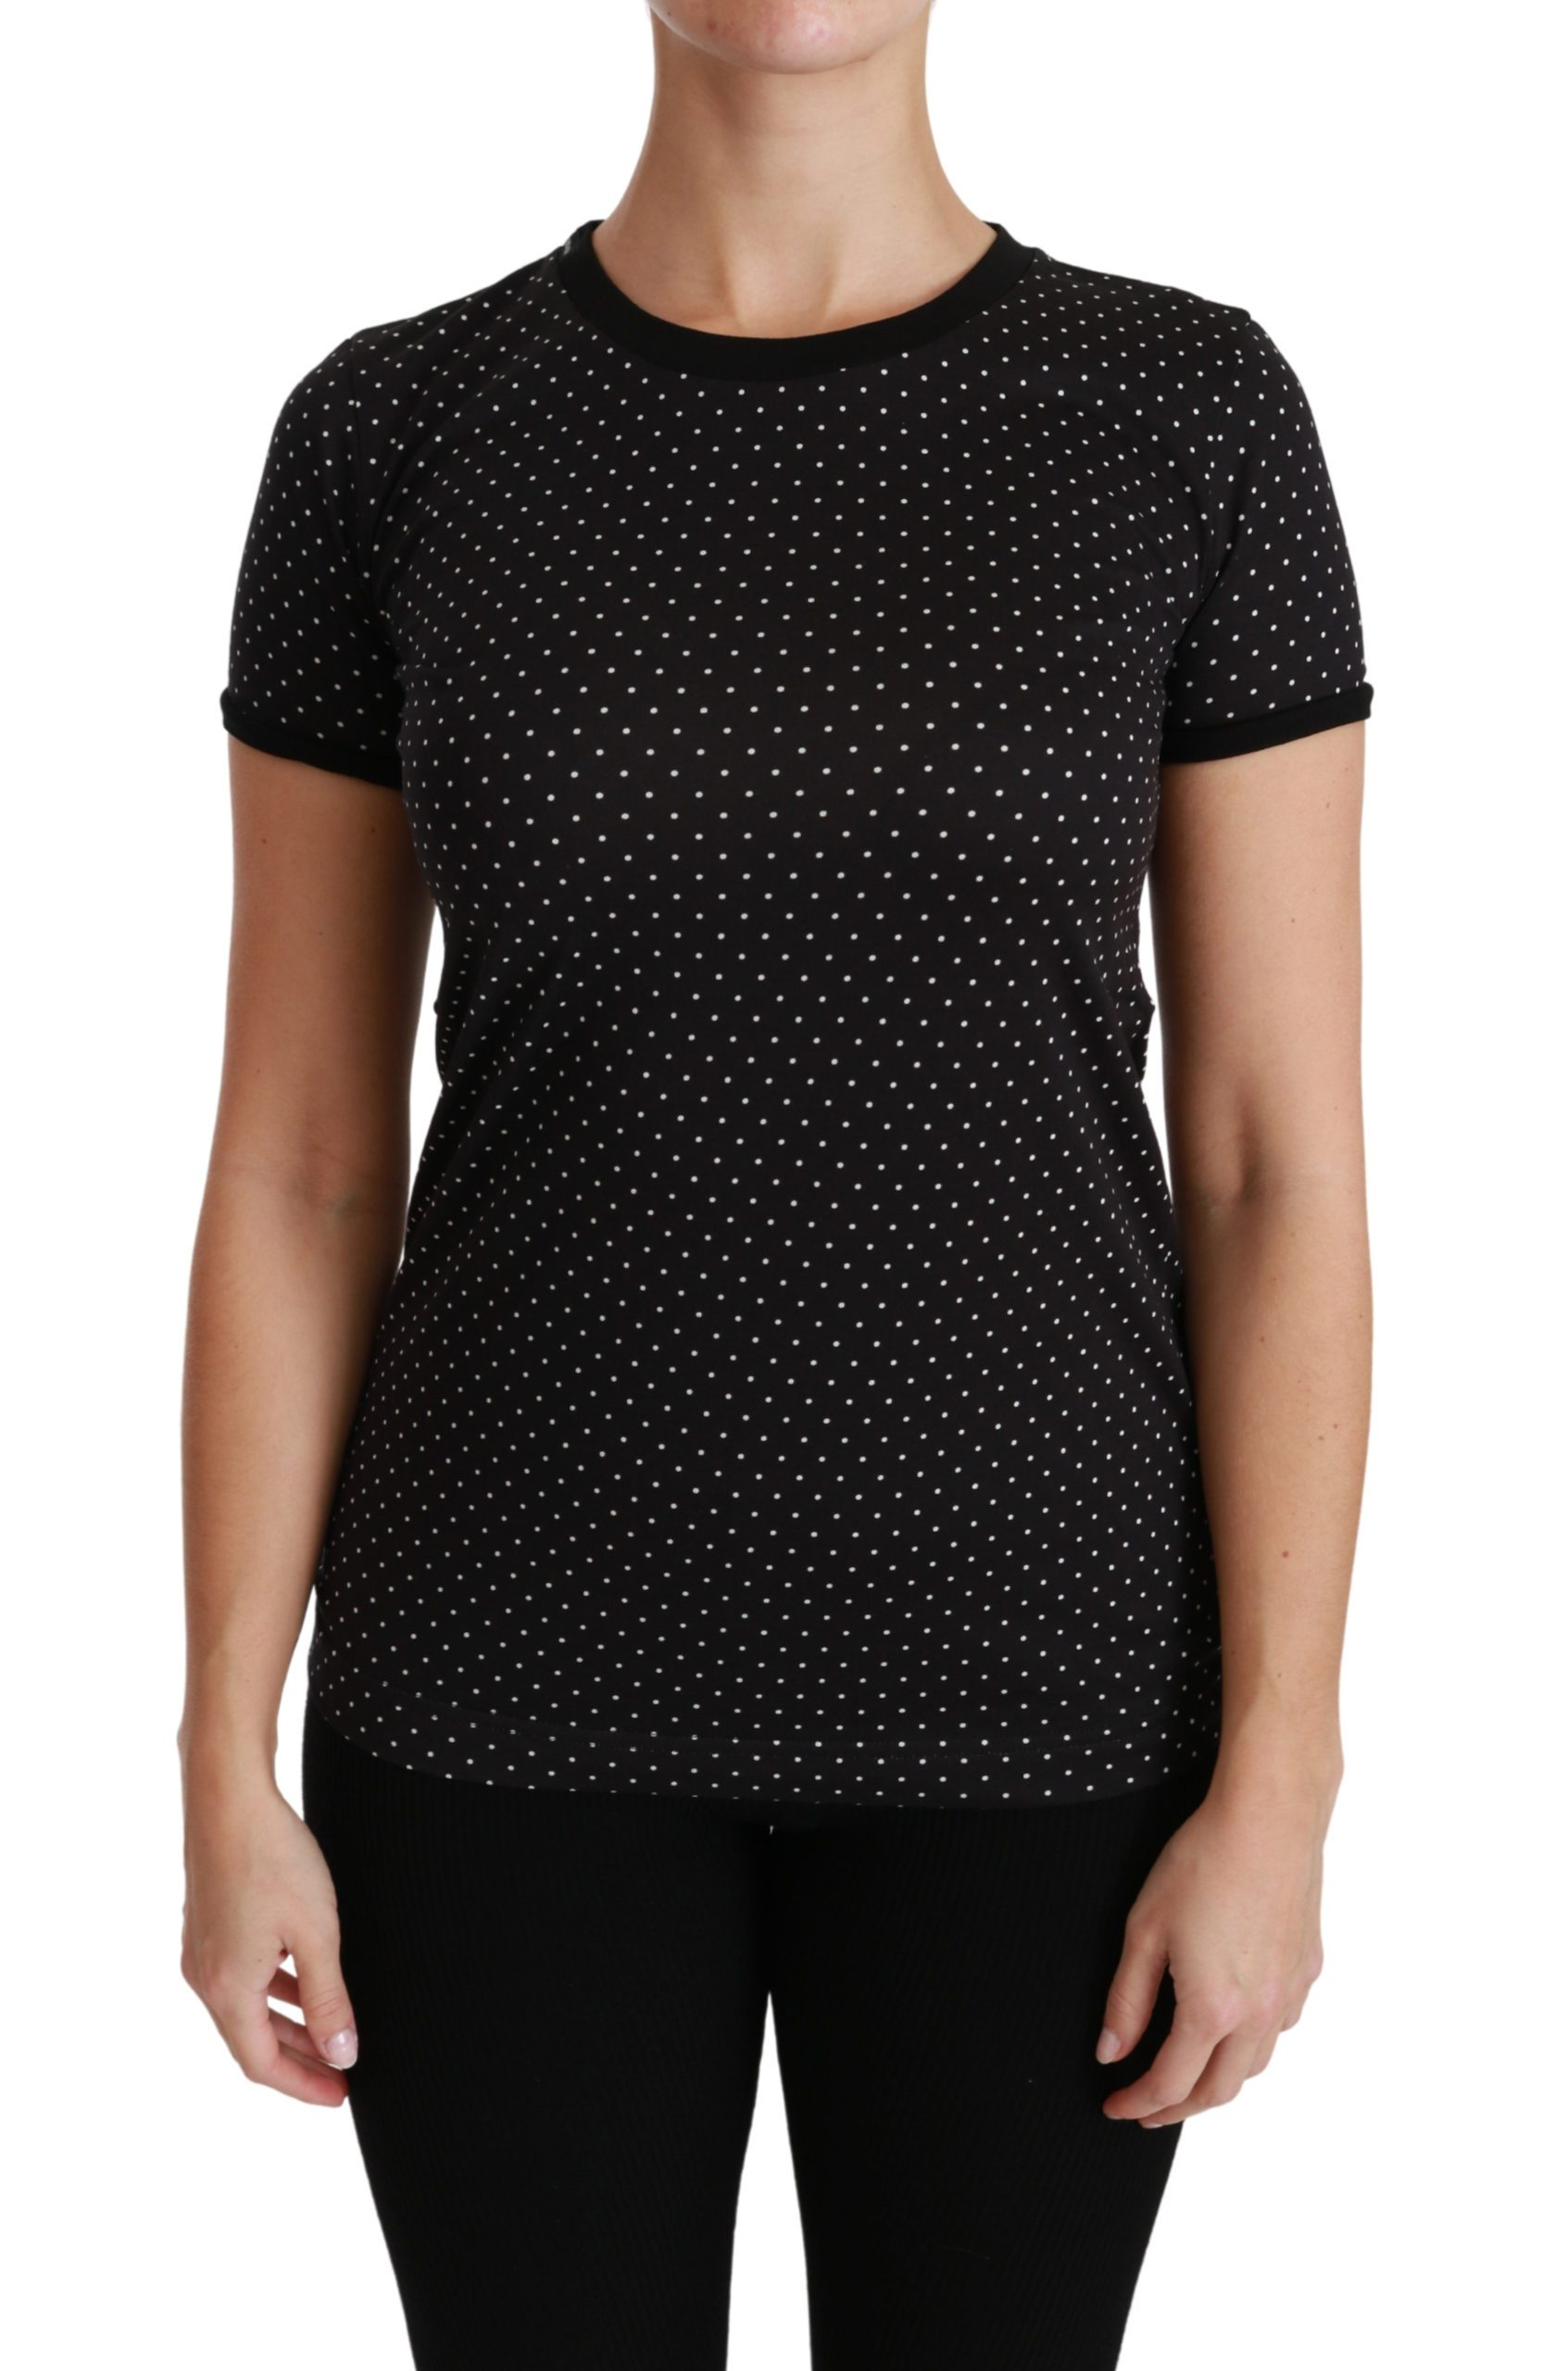 Dolce & Gabbana Women's Dotted Crewneck Cotton T-Shirt Black TSH4435 - IT38 | S